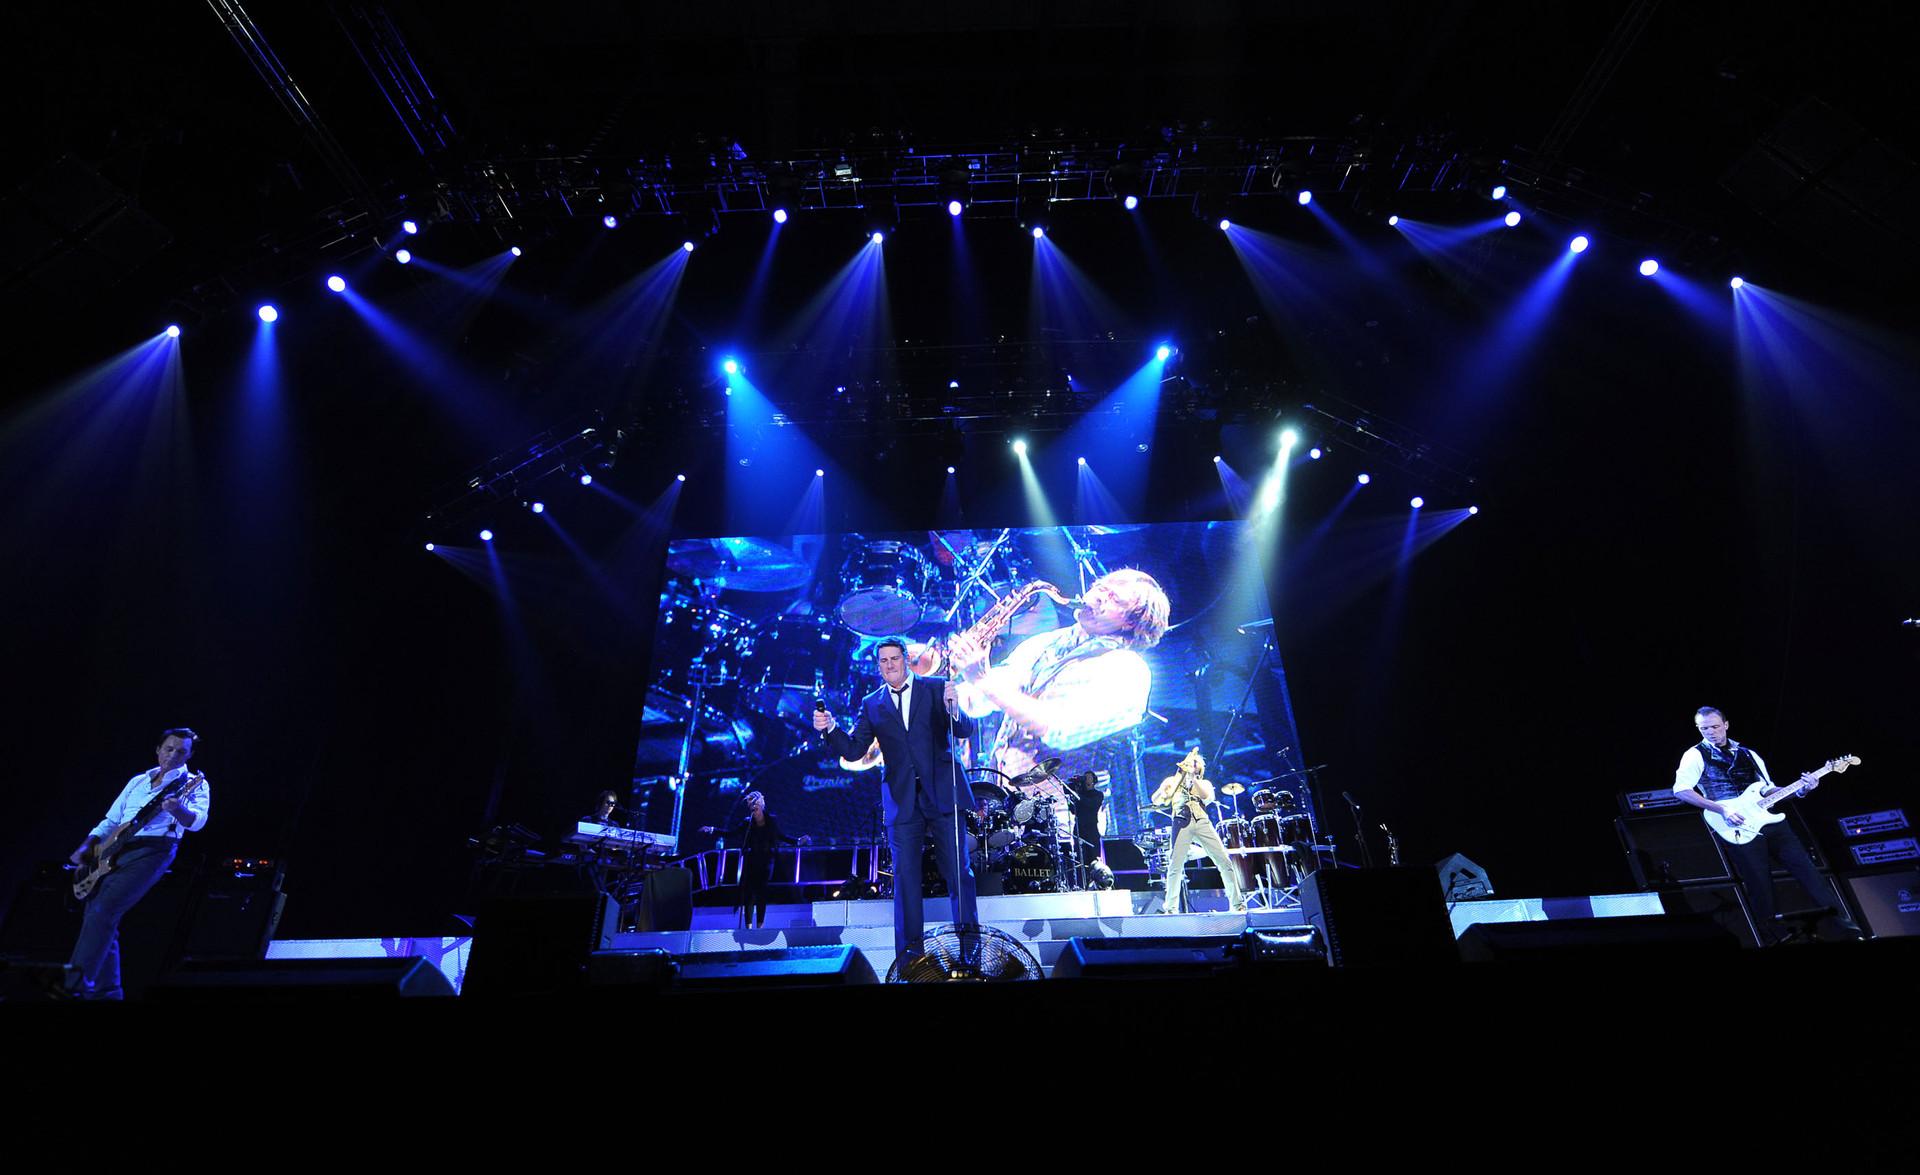 SPANDAU BALLET - REUNION TOUR - 2010